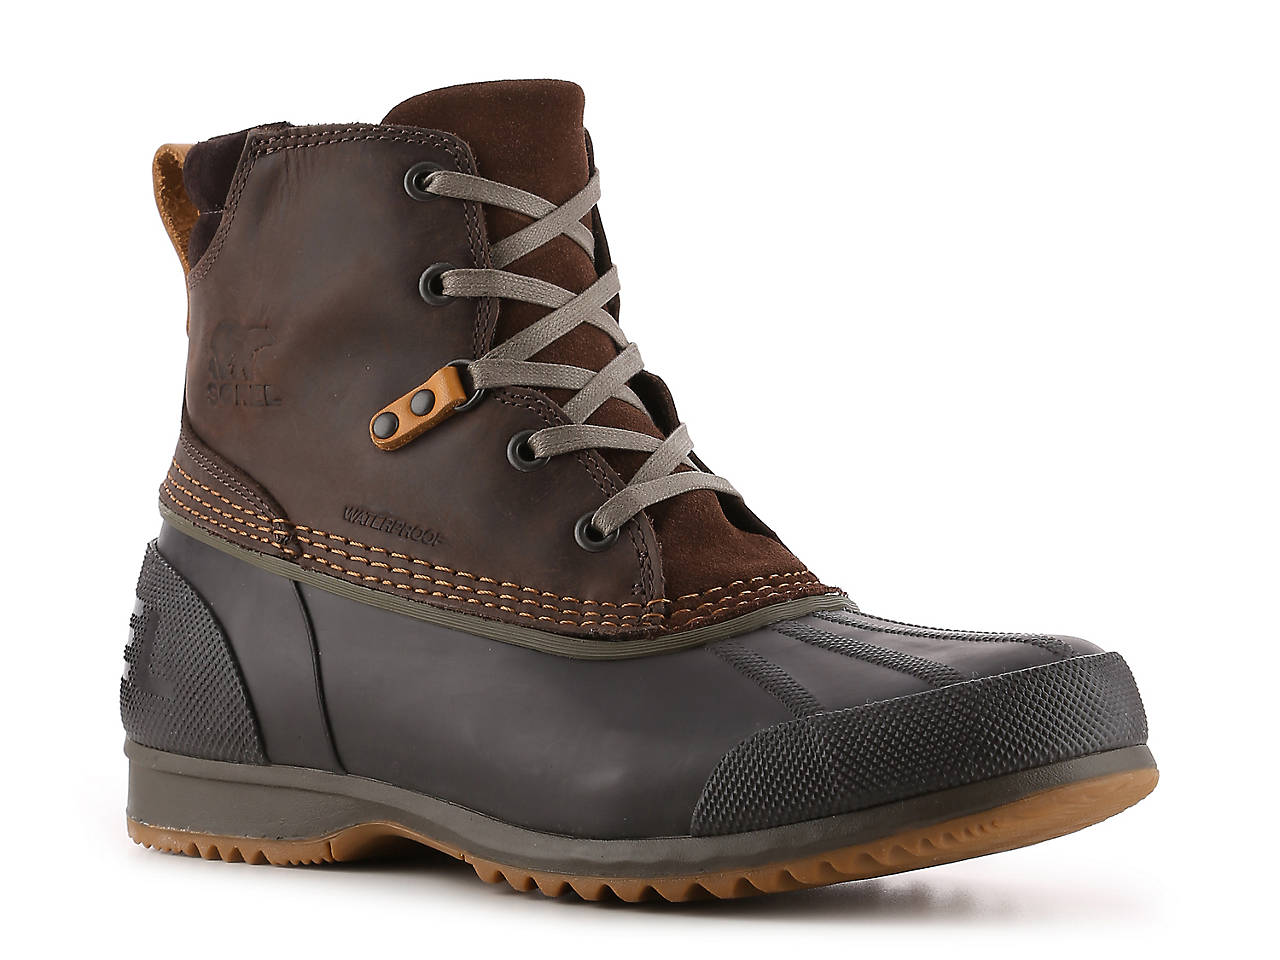 67a0d8843c1 Ankeny Duck Boot